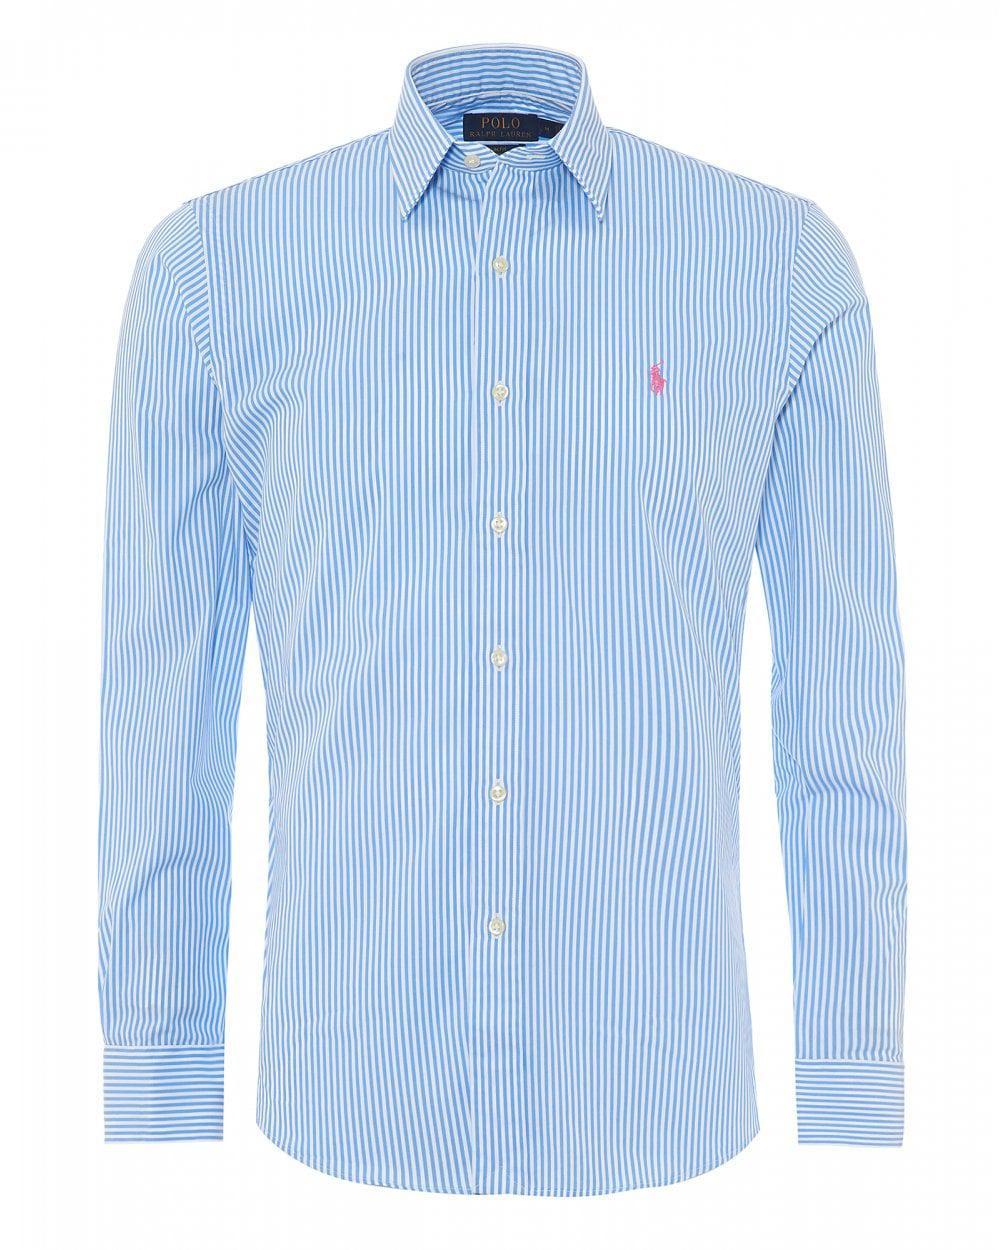 04524ebe6 Ralph Lauren Men Fine Stripe Powder Blue White Slim Shirt in Blue ...